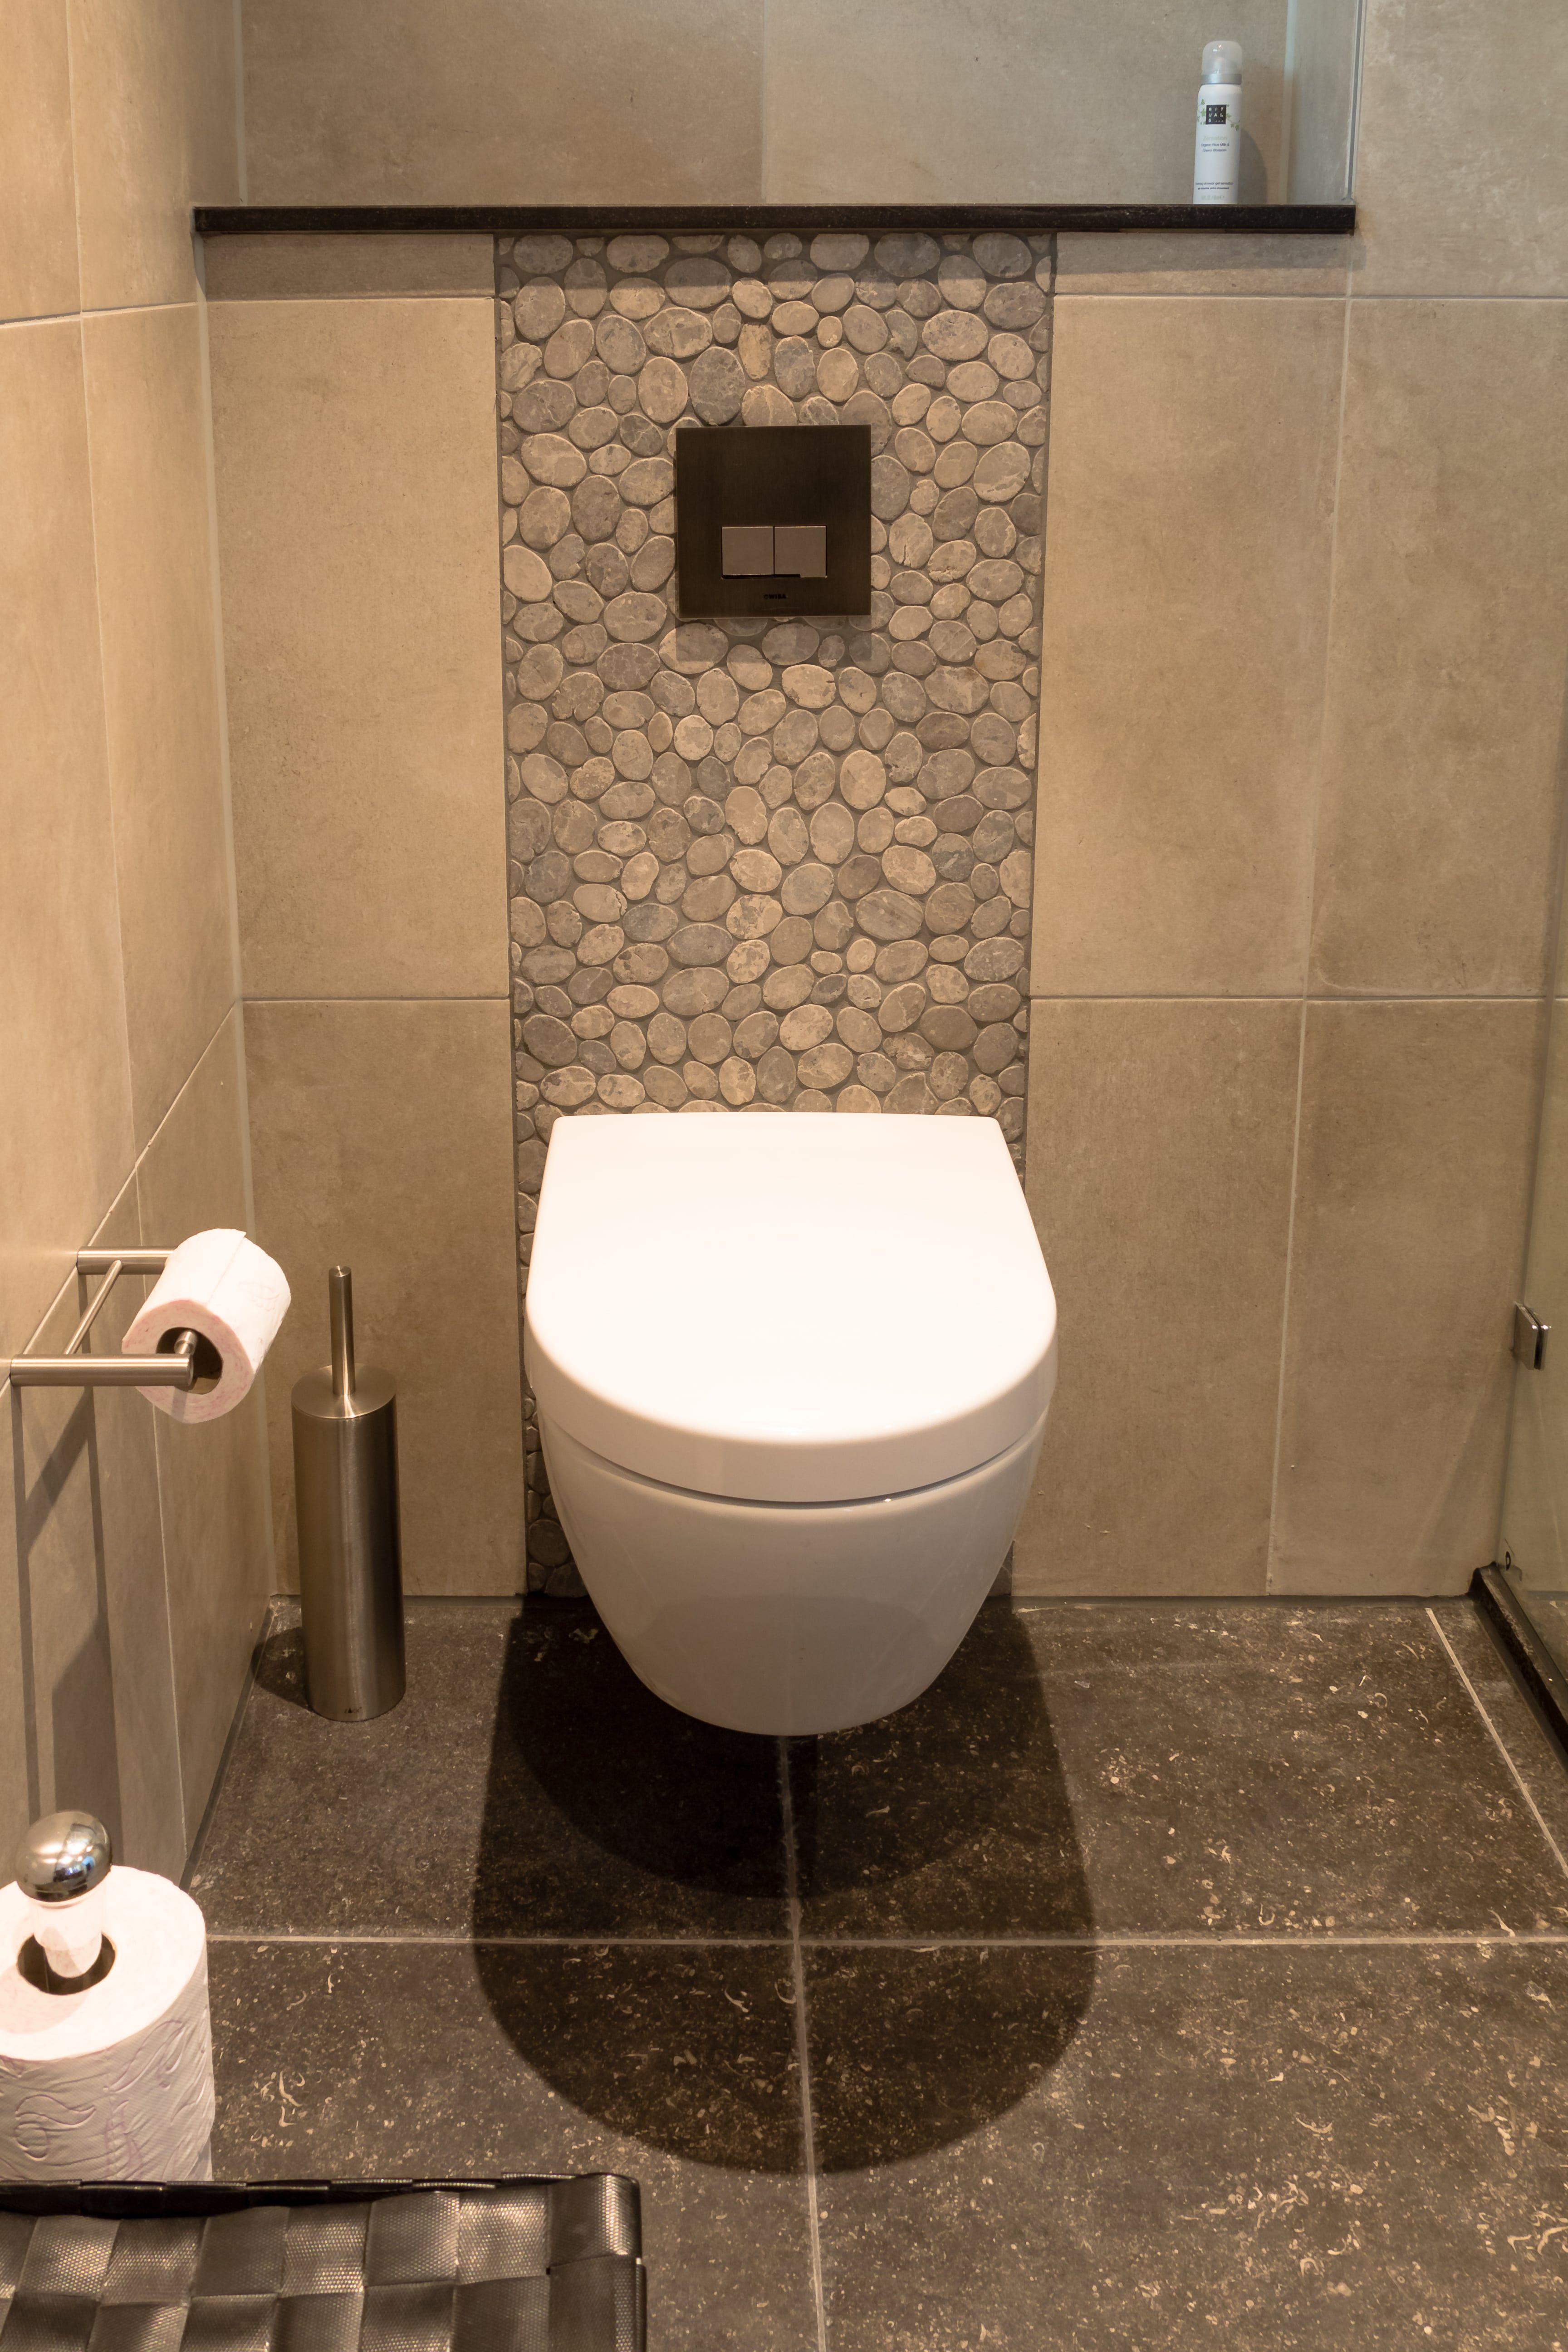 mozaà ek tegels tegels badkamer grijs tegelstroken toilet